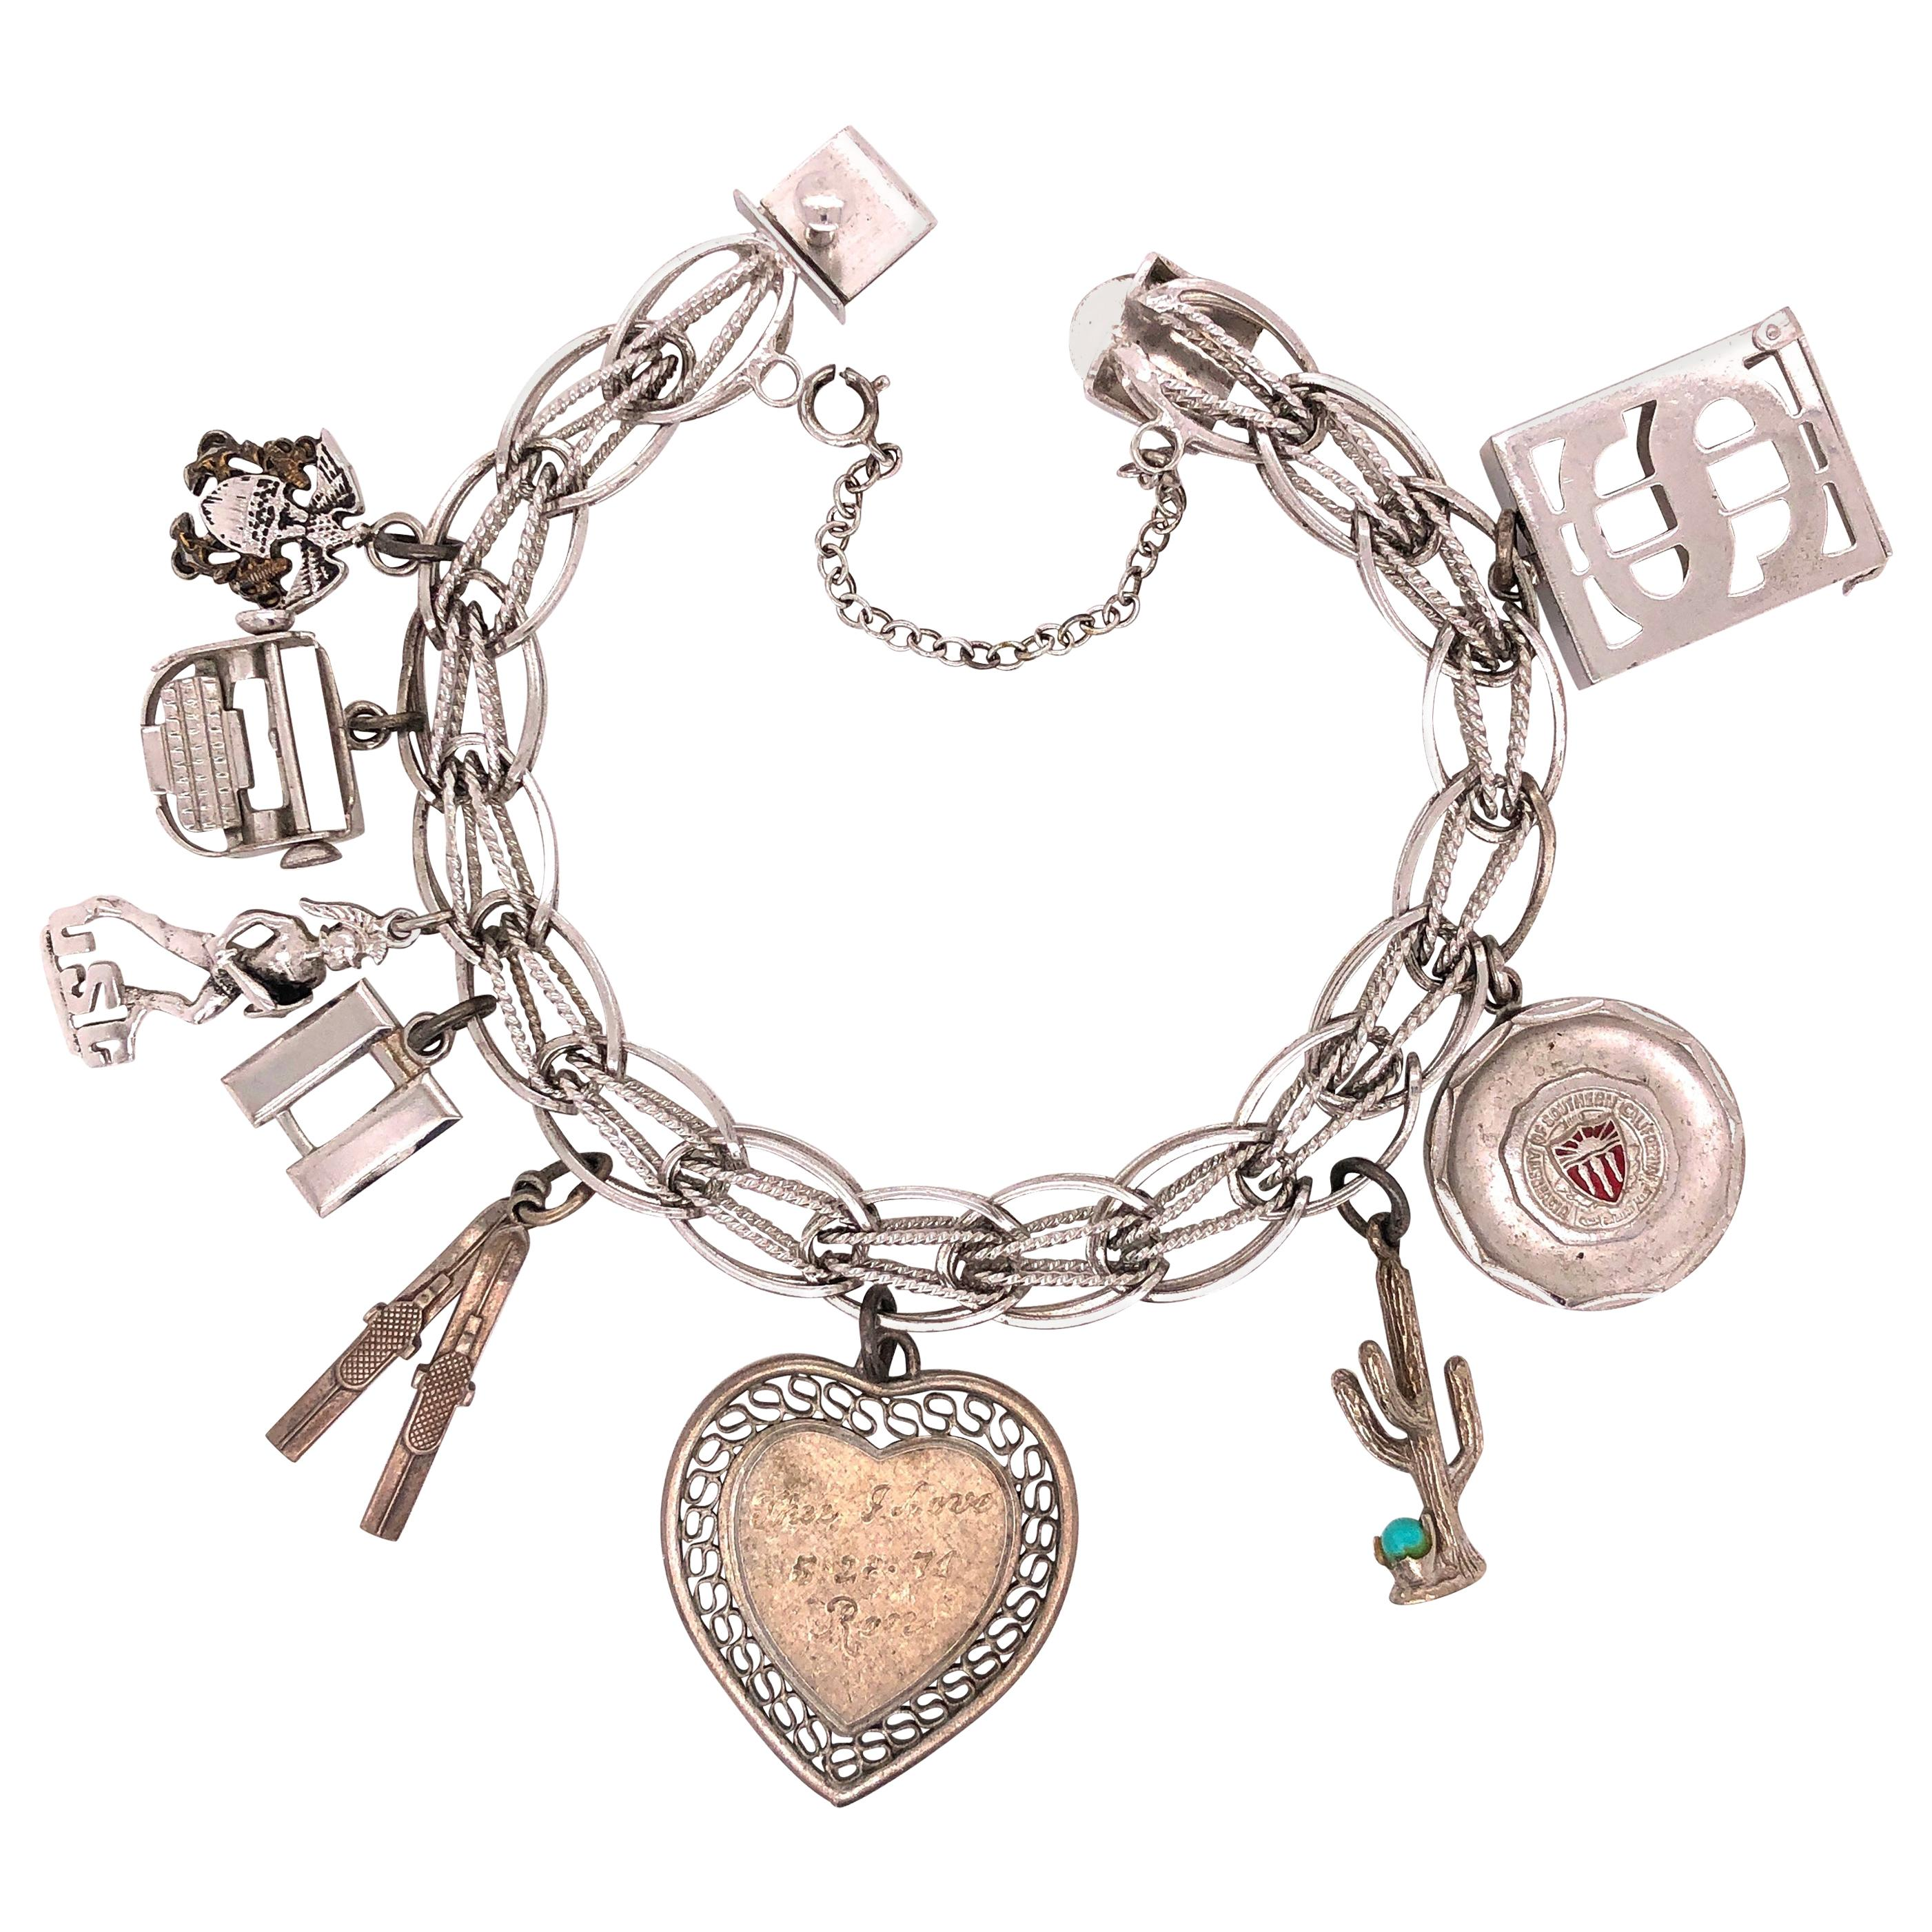 Love Birds on a Ring Mechanical Sterling Silver Vintage Charm For Bracelet